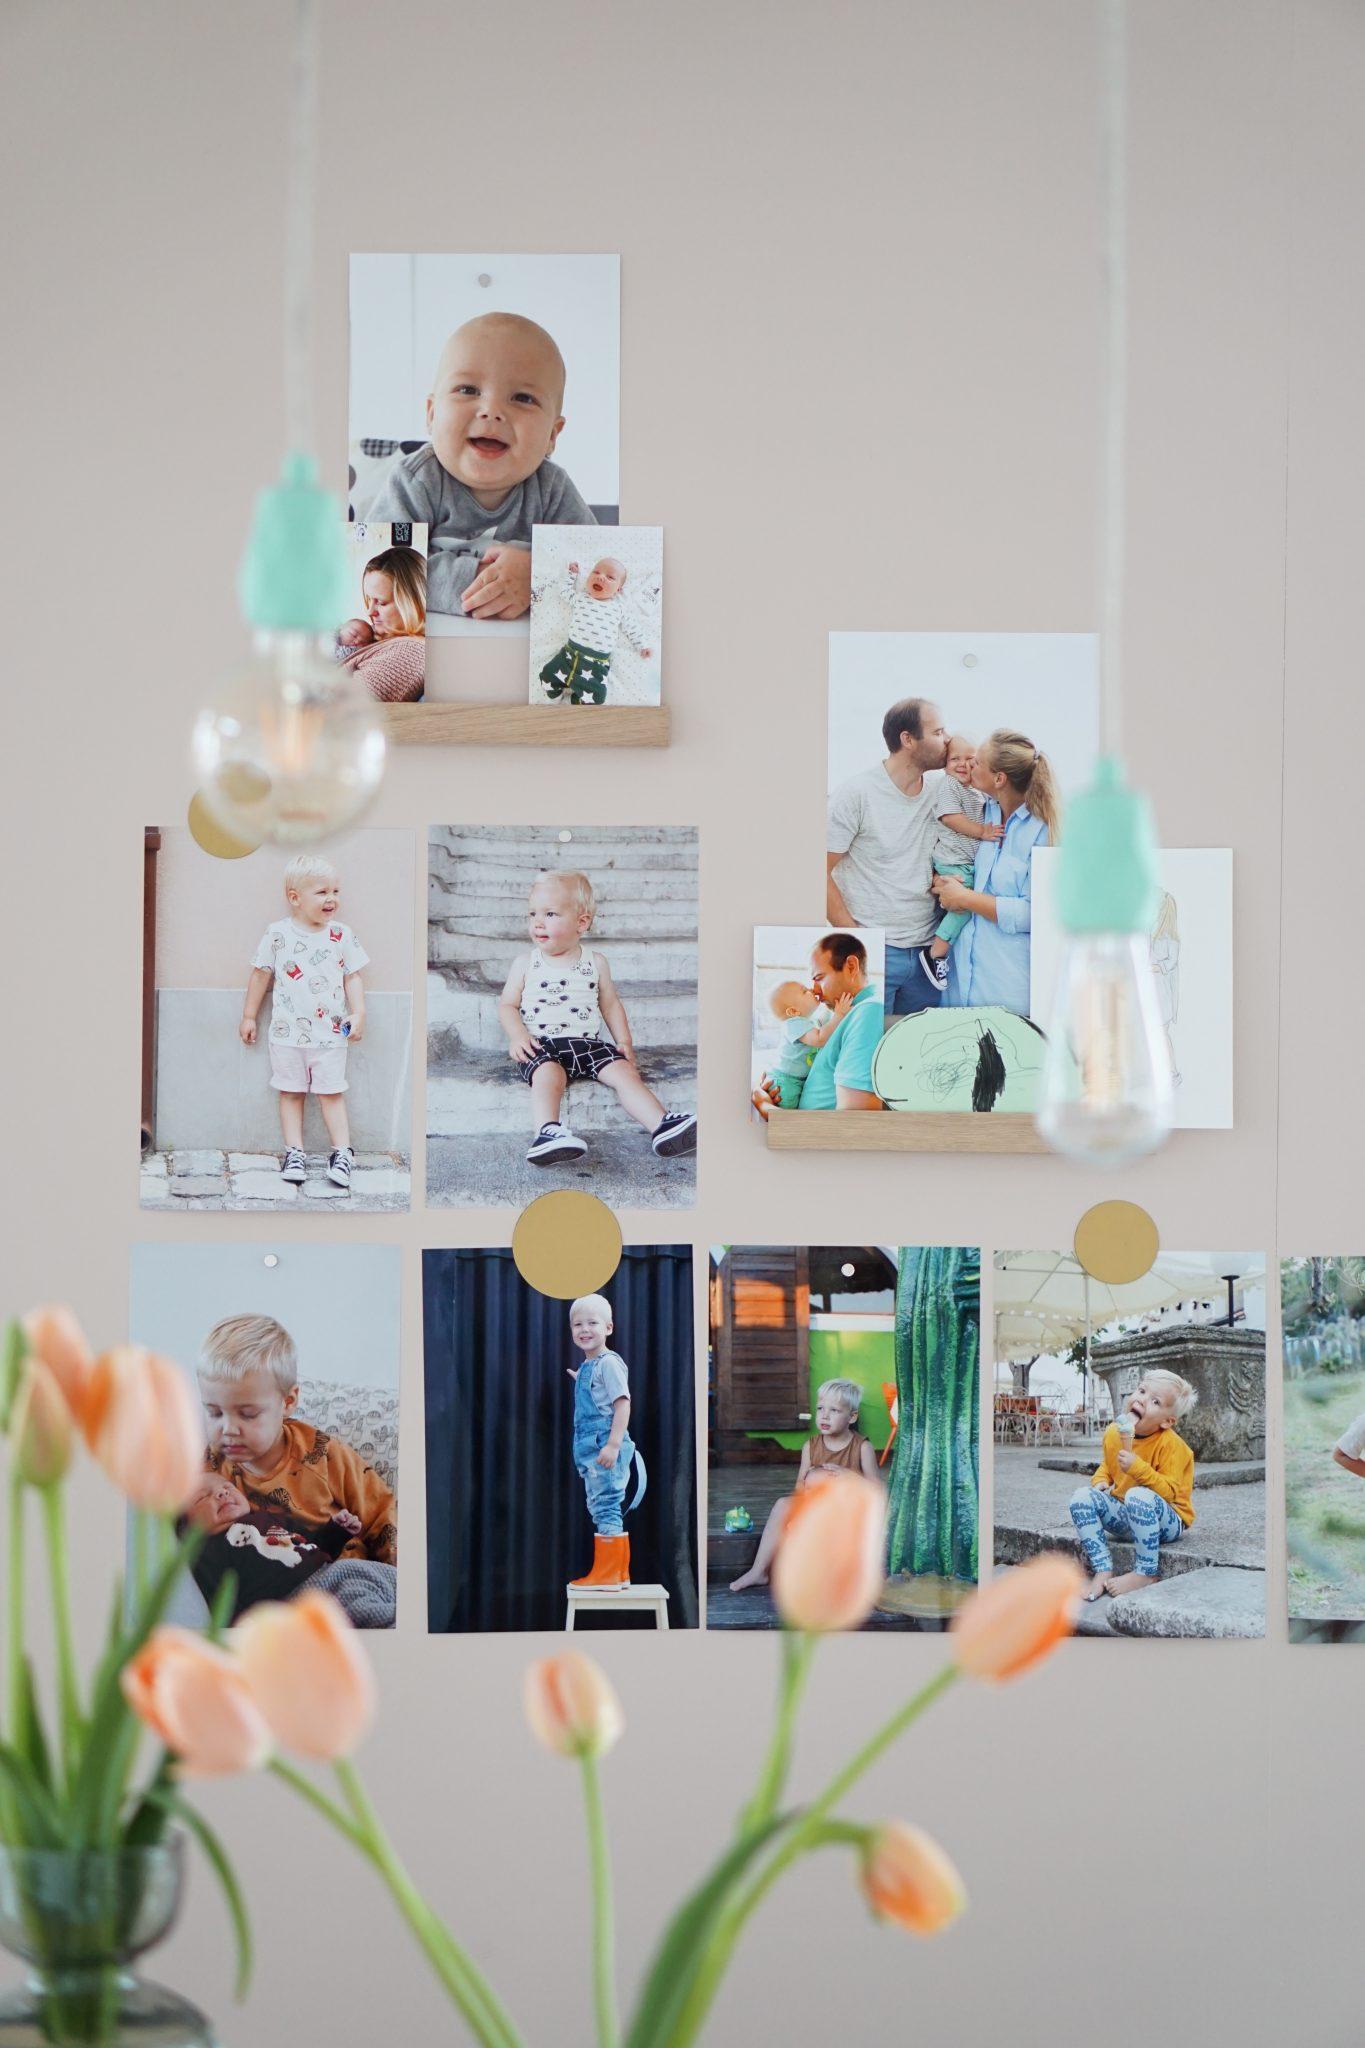 foto's printen epson